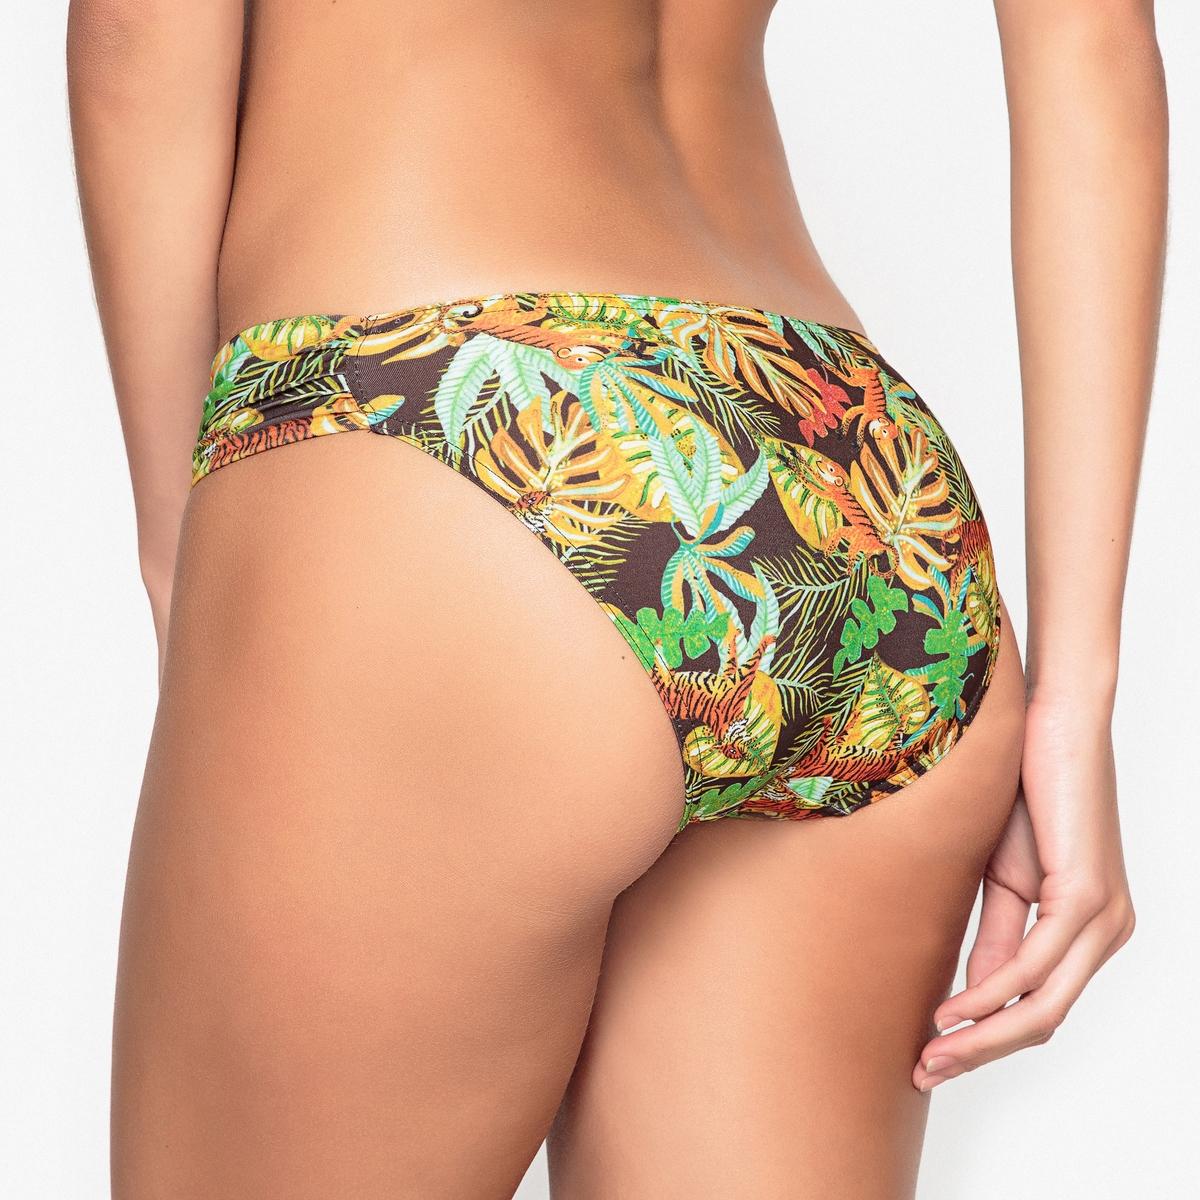 Плавки от купальника с этническим рисунком, форма бикини